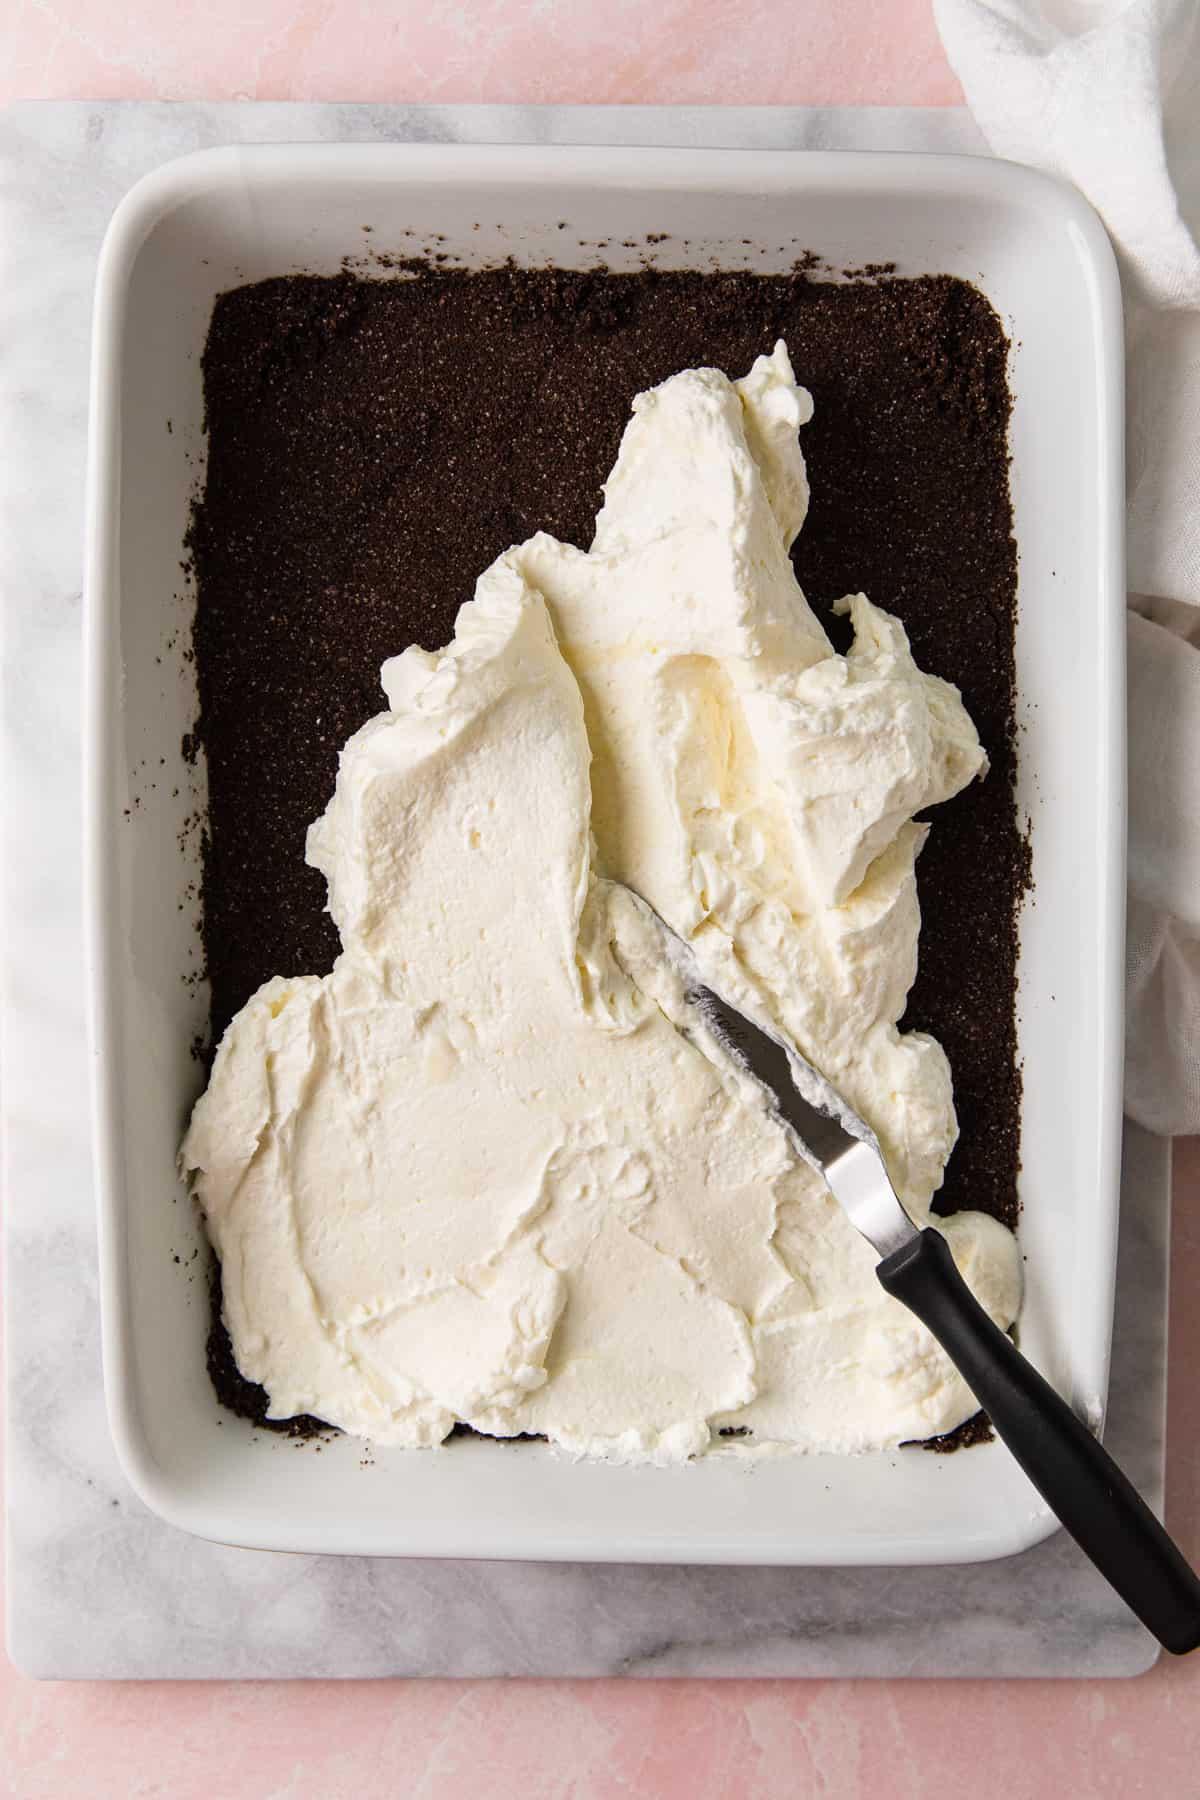 Spreading cream cheese mixture over chocolate crust.